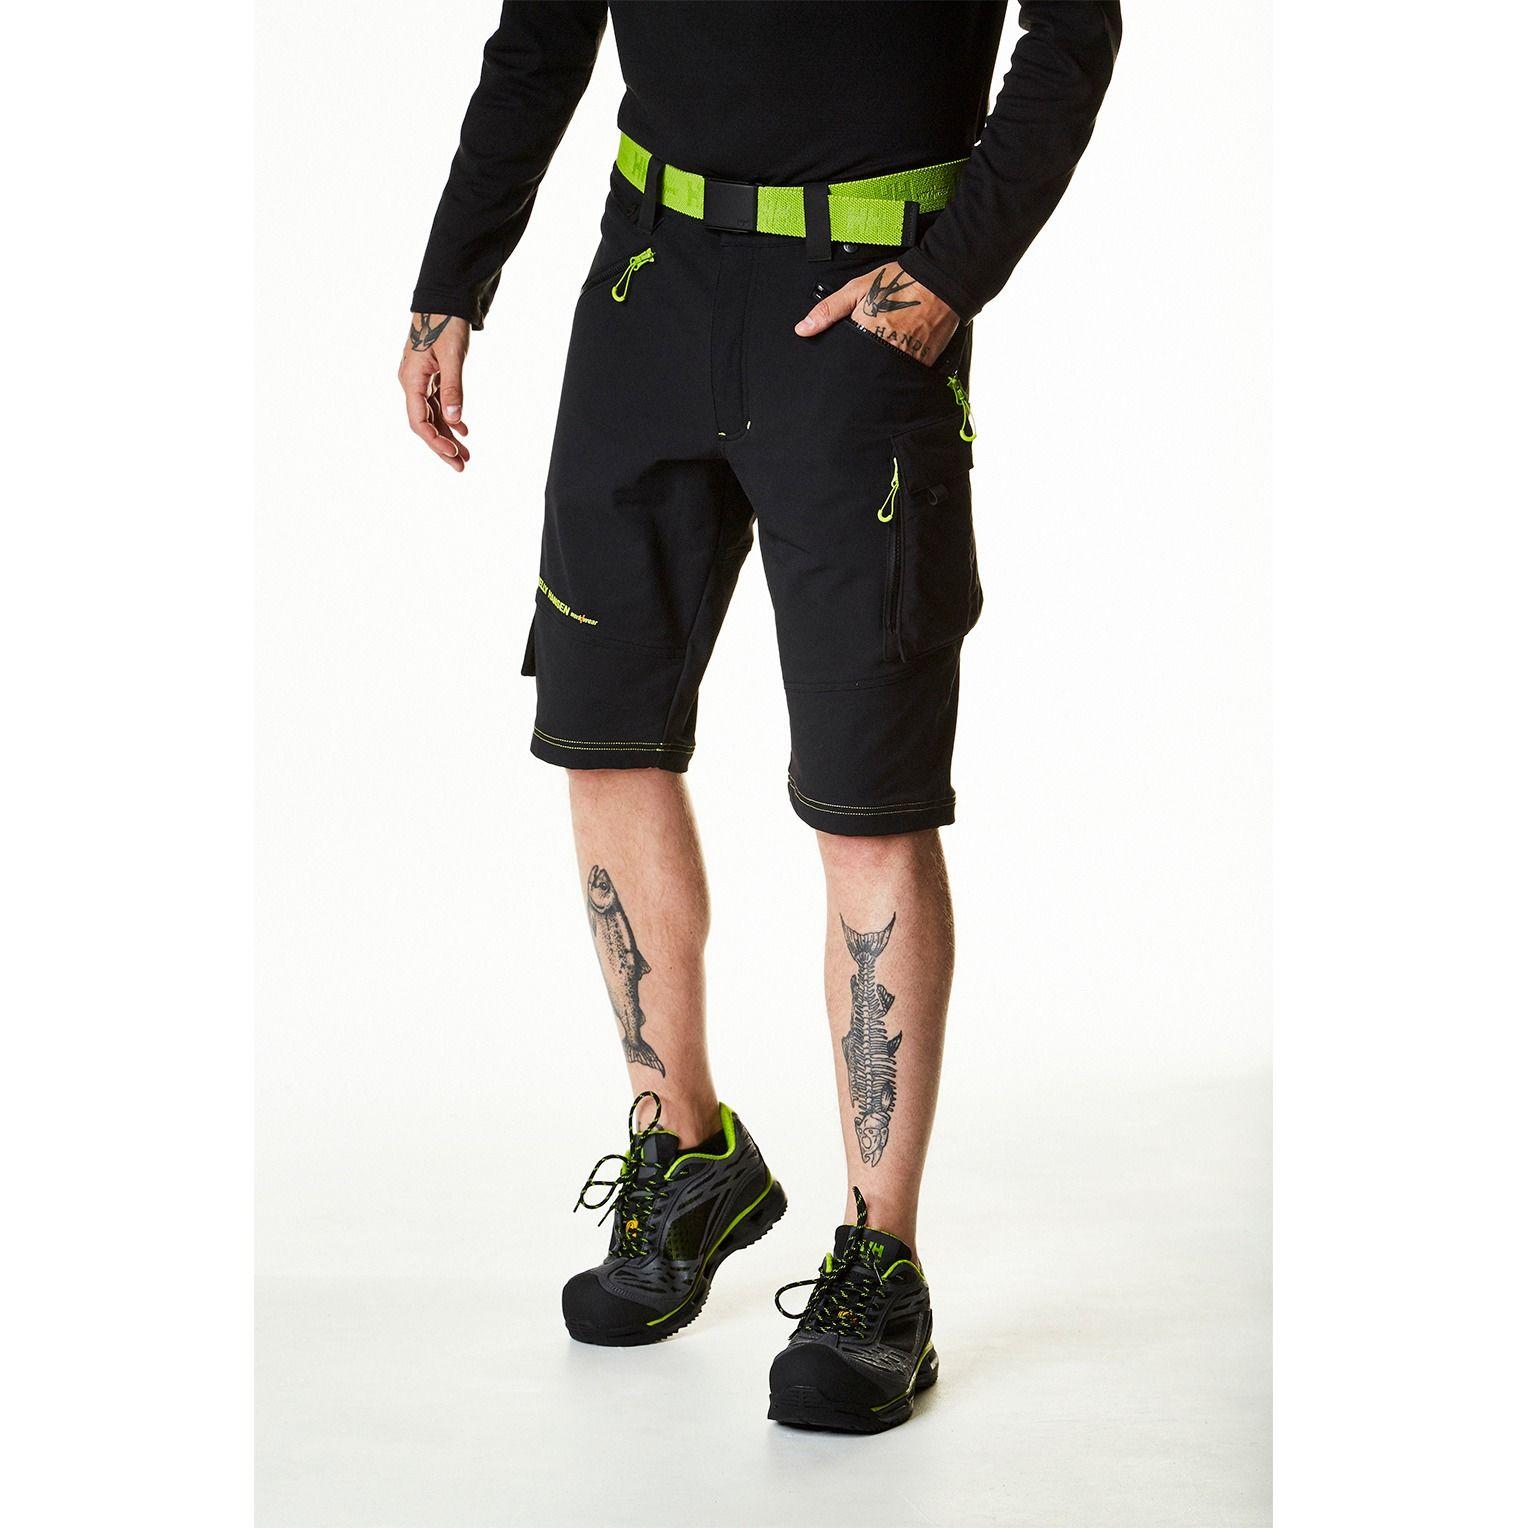 afeea31c magni shorts/arbeidstøy/arbeidsbukse/helly hansen/haugseng.no